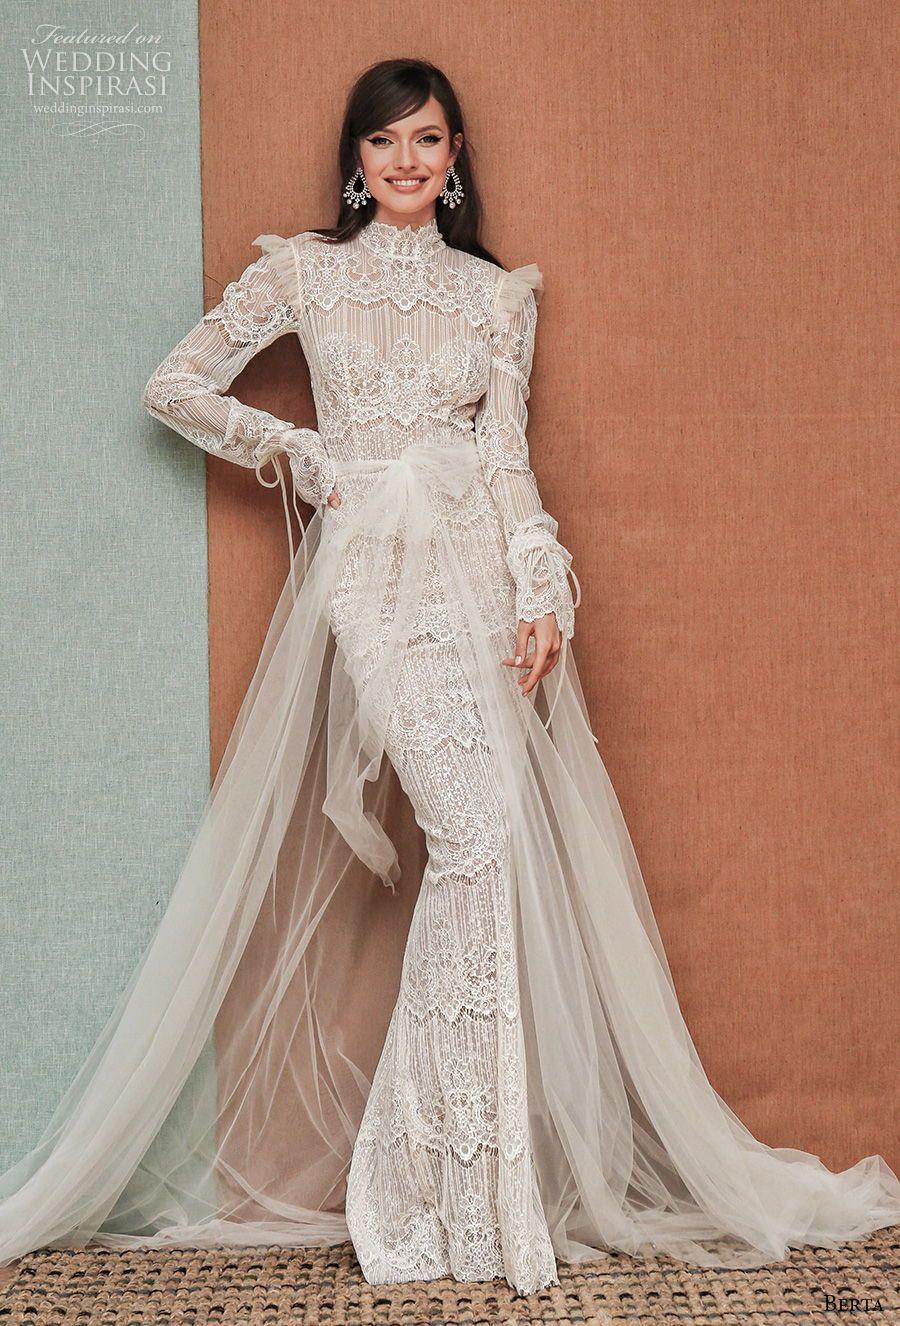 Berta Privee Spring 2021 Wedding Dresses Wedding Inspirasi Wedding Dress Long Sleeve Wedding Dresses Unique Wedding Dresses [ 1326 x 900 Pixel ]